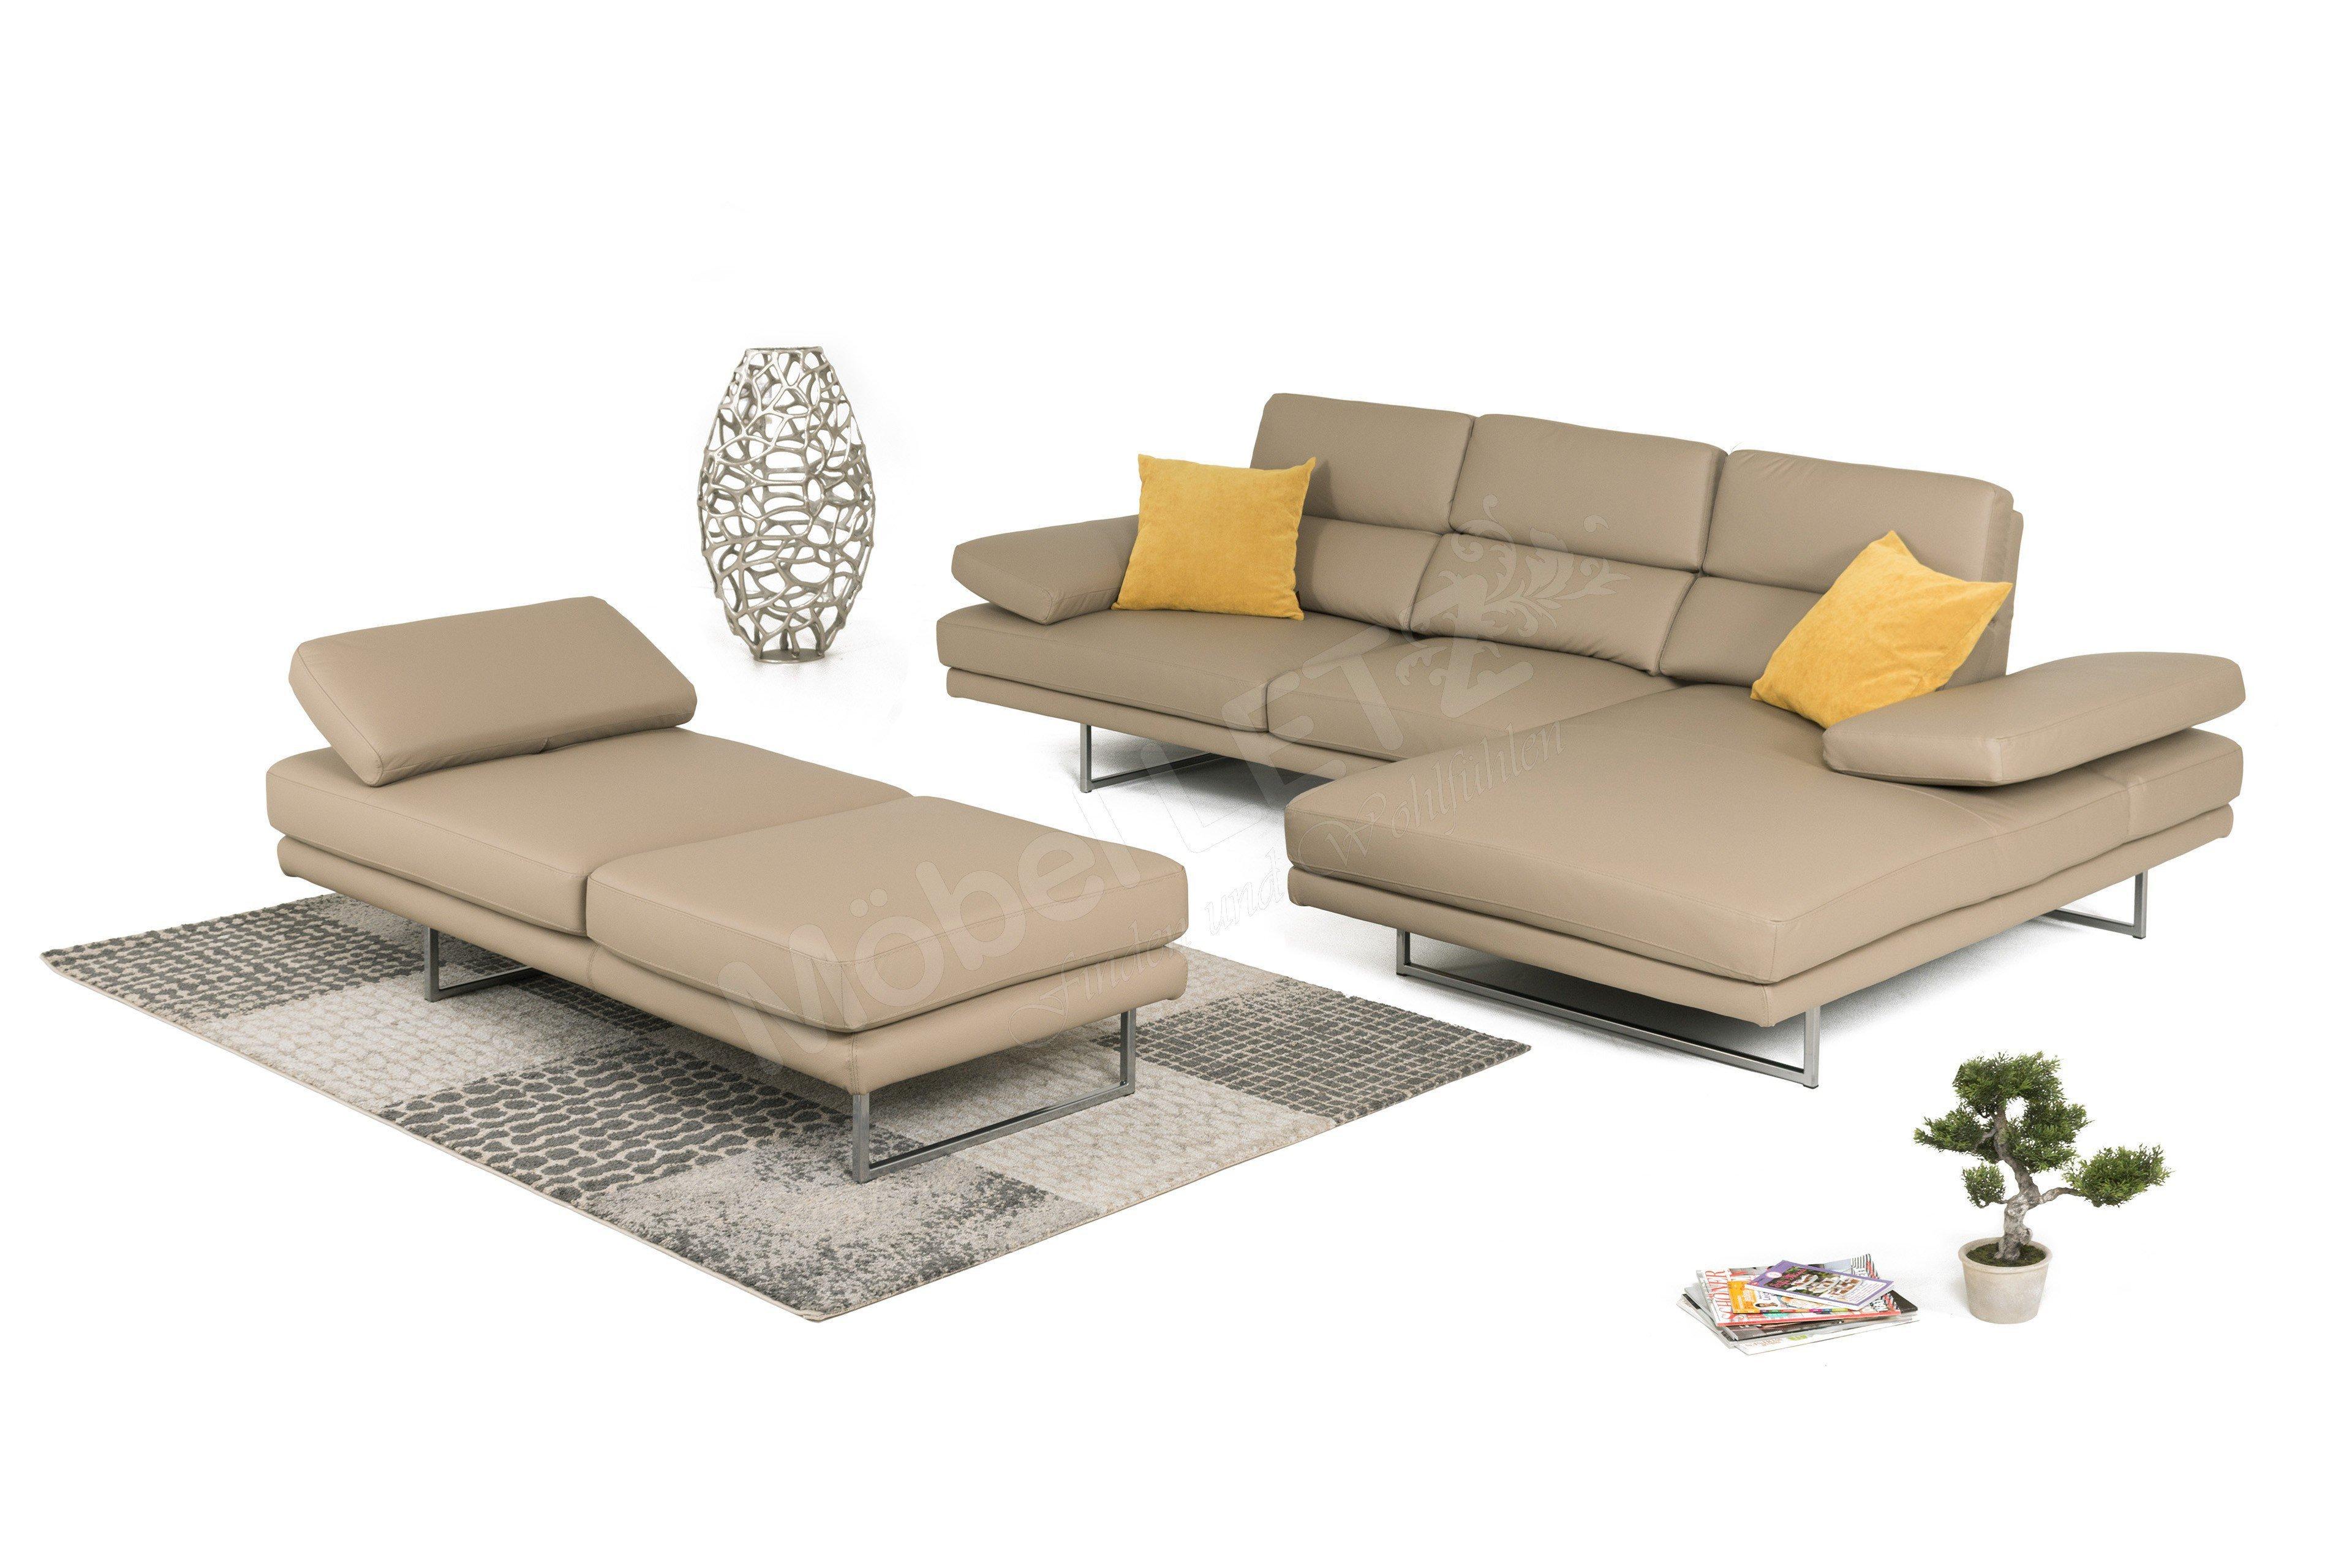 emejing chaise longue divano contemporary. Black Bedroom Furniture Sets. Home Design Ideas